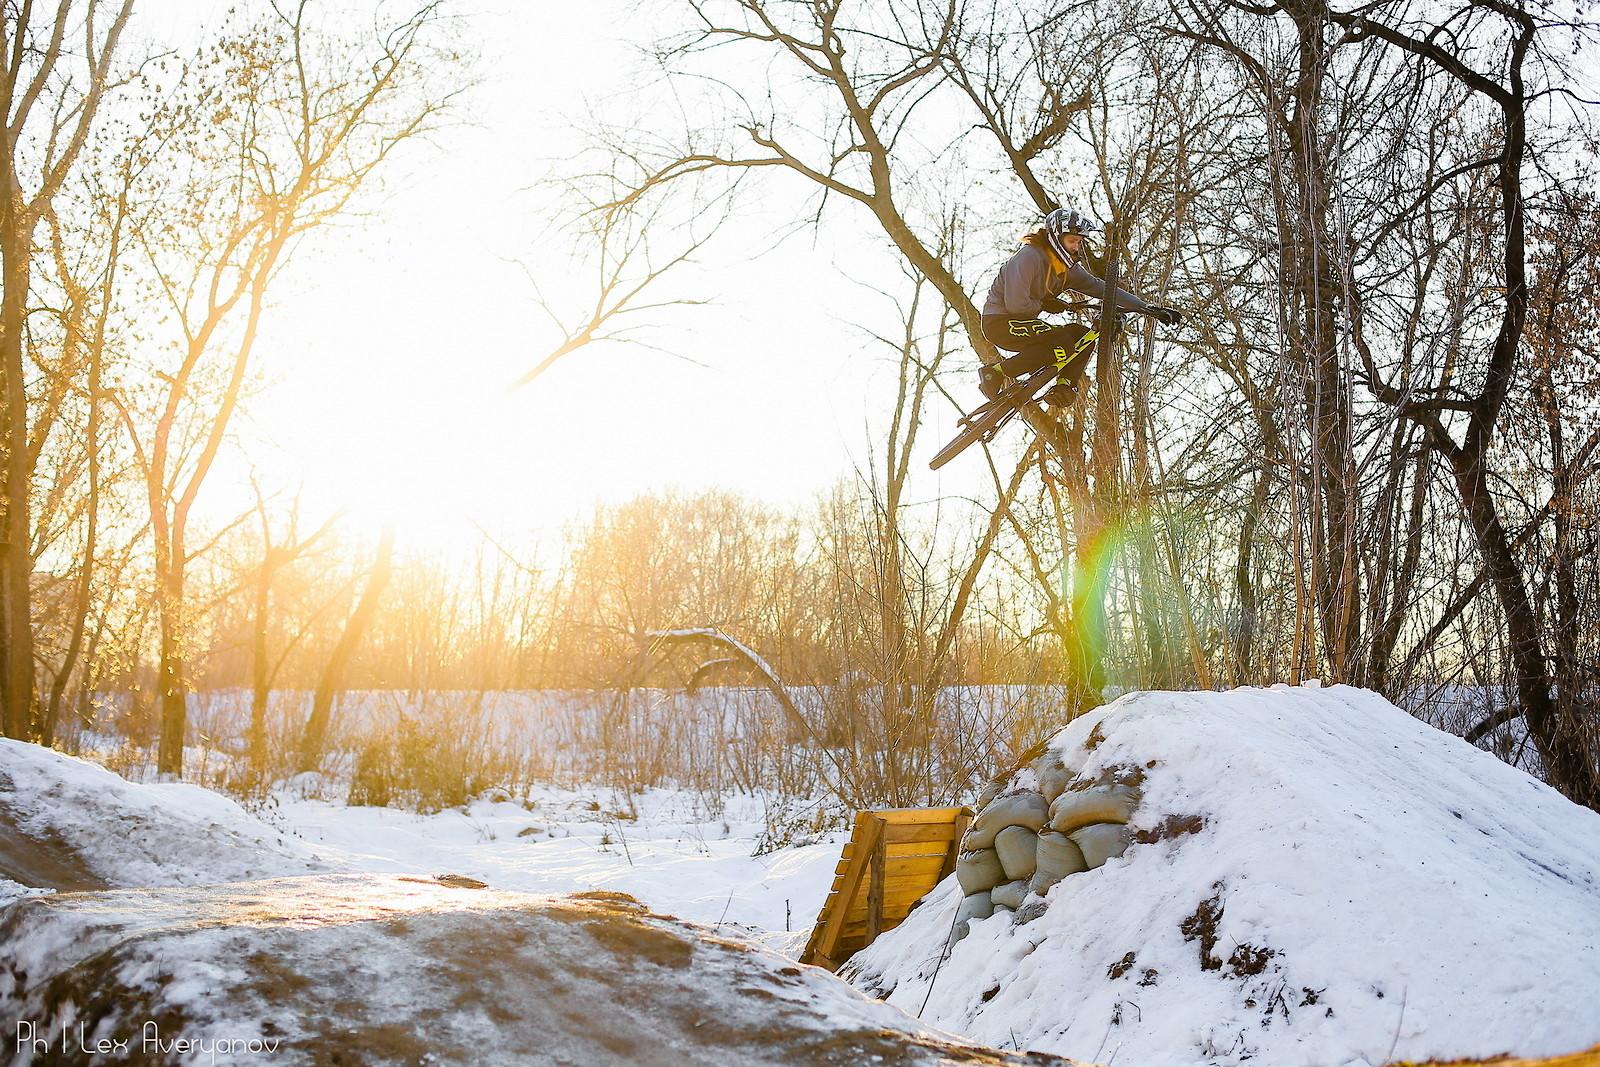 Winter table? - YakuT - Mountain Biking Pictures - Vital MTB